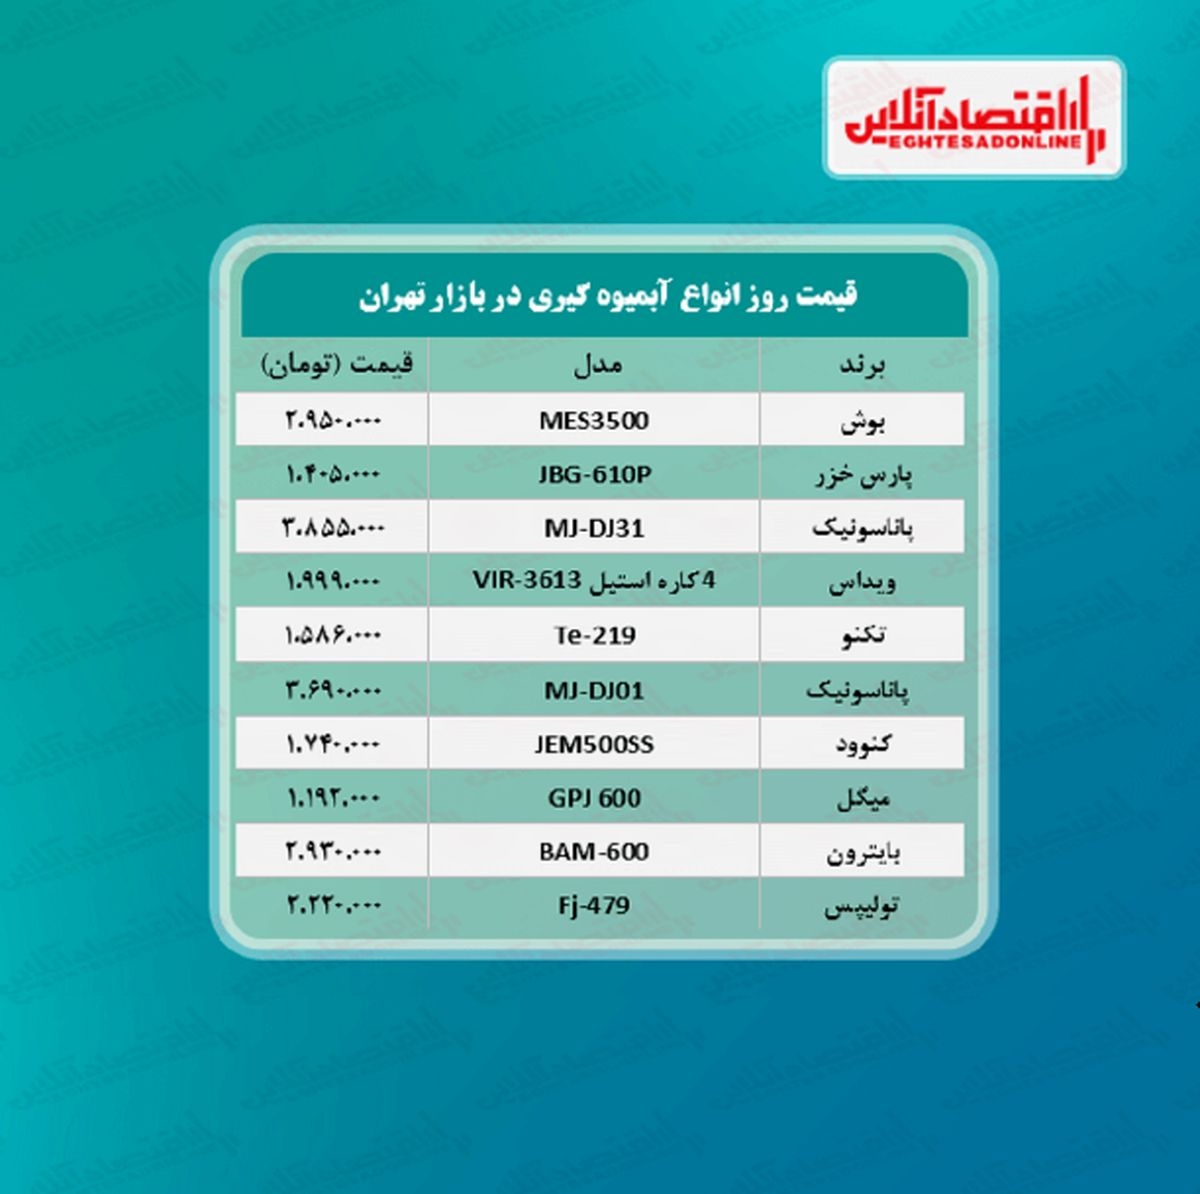 قیمت جدید آبمیوه گیری (خرداد ۱۴۰۰)